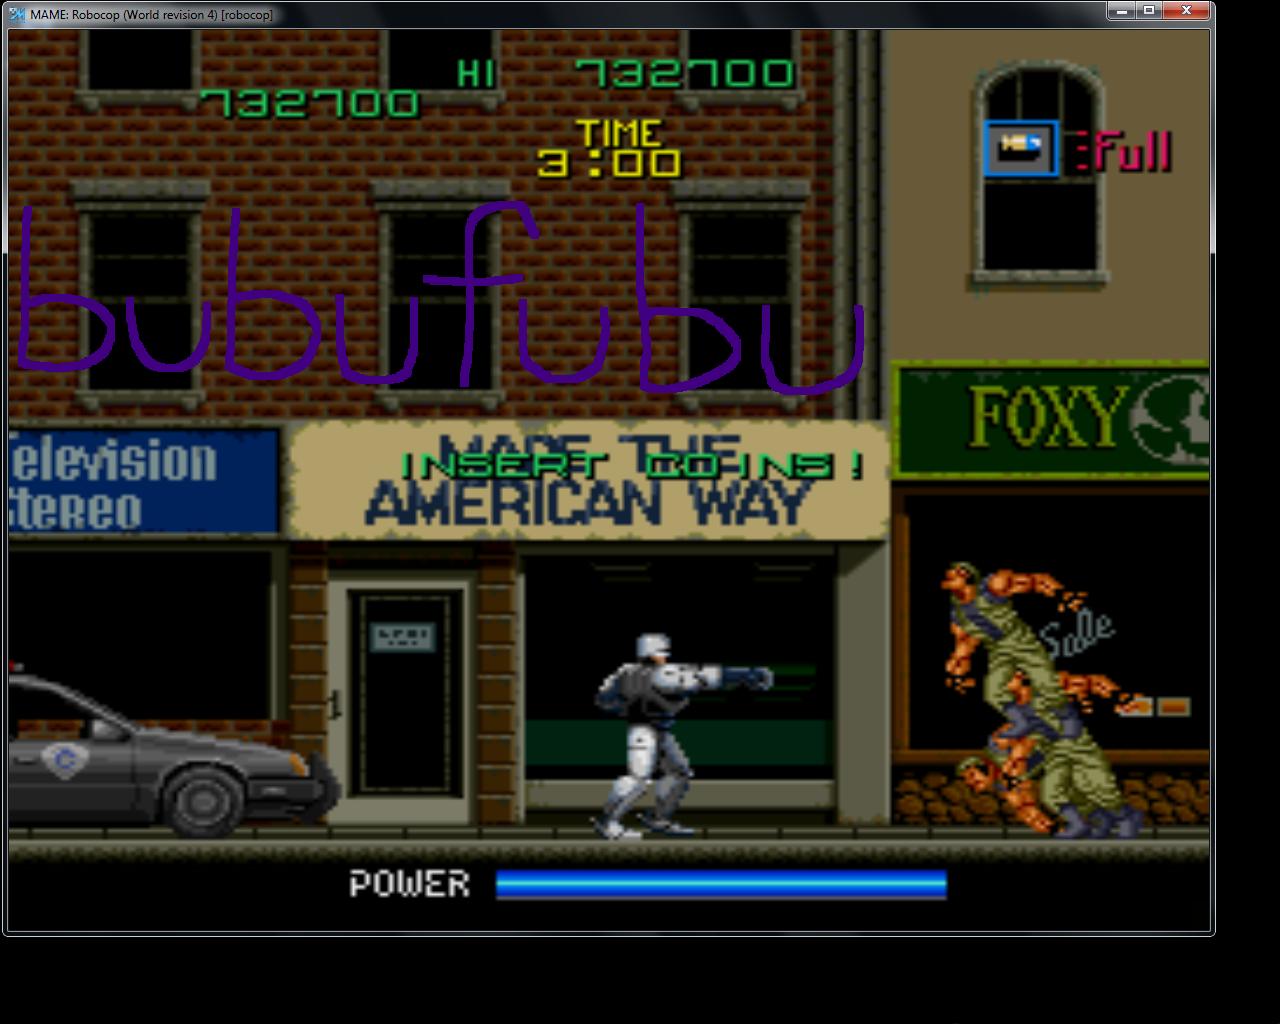 bubufubu: RoboCop [robocop] (Arcade Emulated / M.A.M.E.) 732,700 points on 2015-05-02 14:29:36